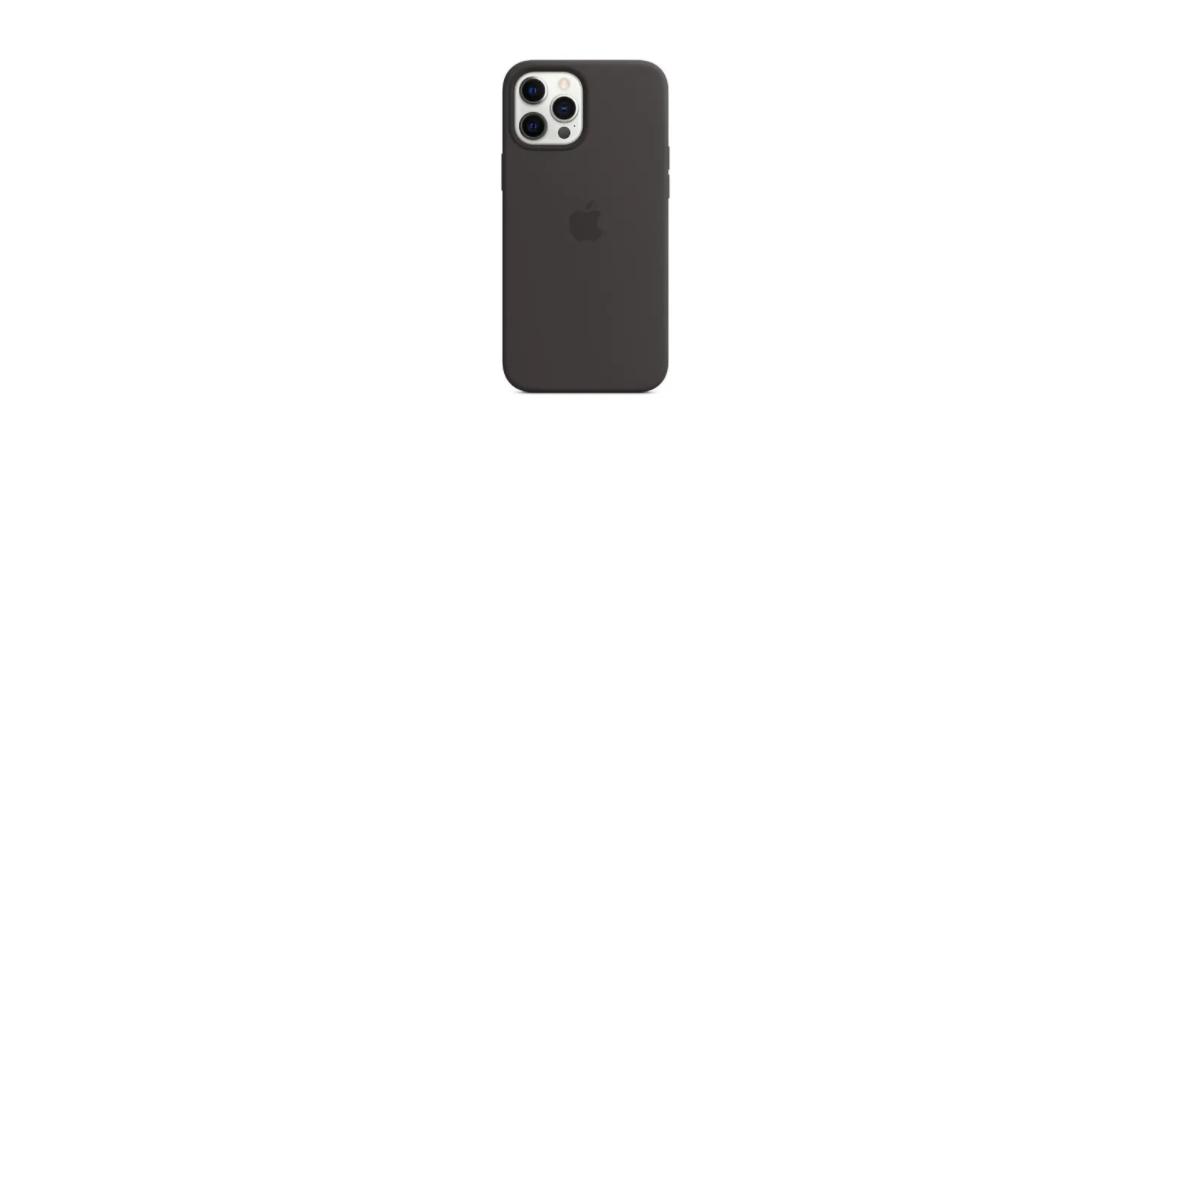 CAPA CAPINHA SILICONE IPHONE 12 PRO MAX PADRAO ORIGINAL PRETA